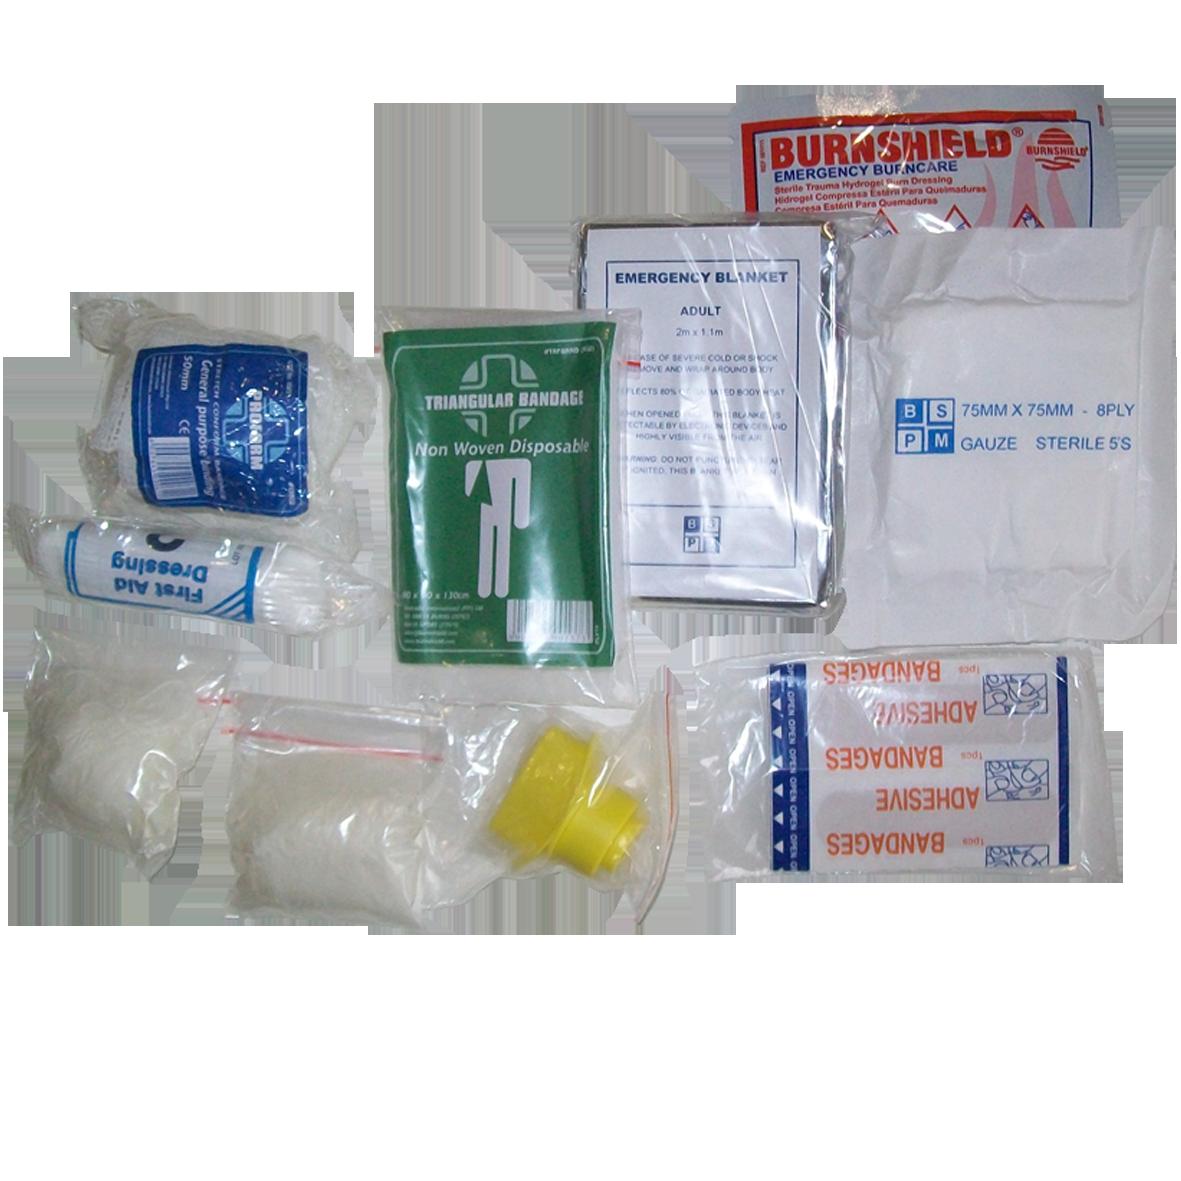 Basic First Aid Kit 0010